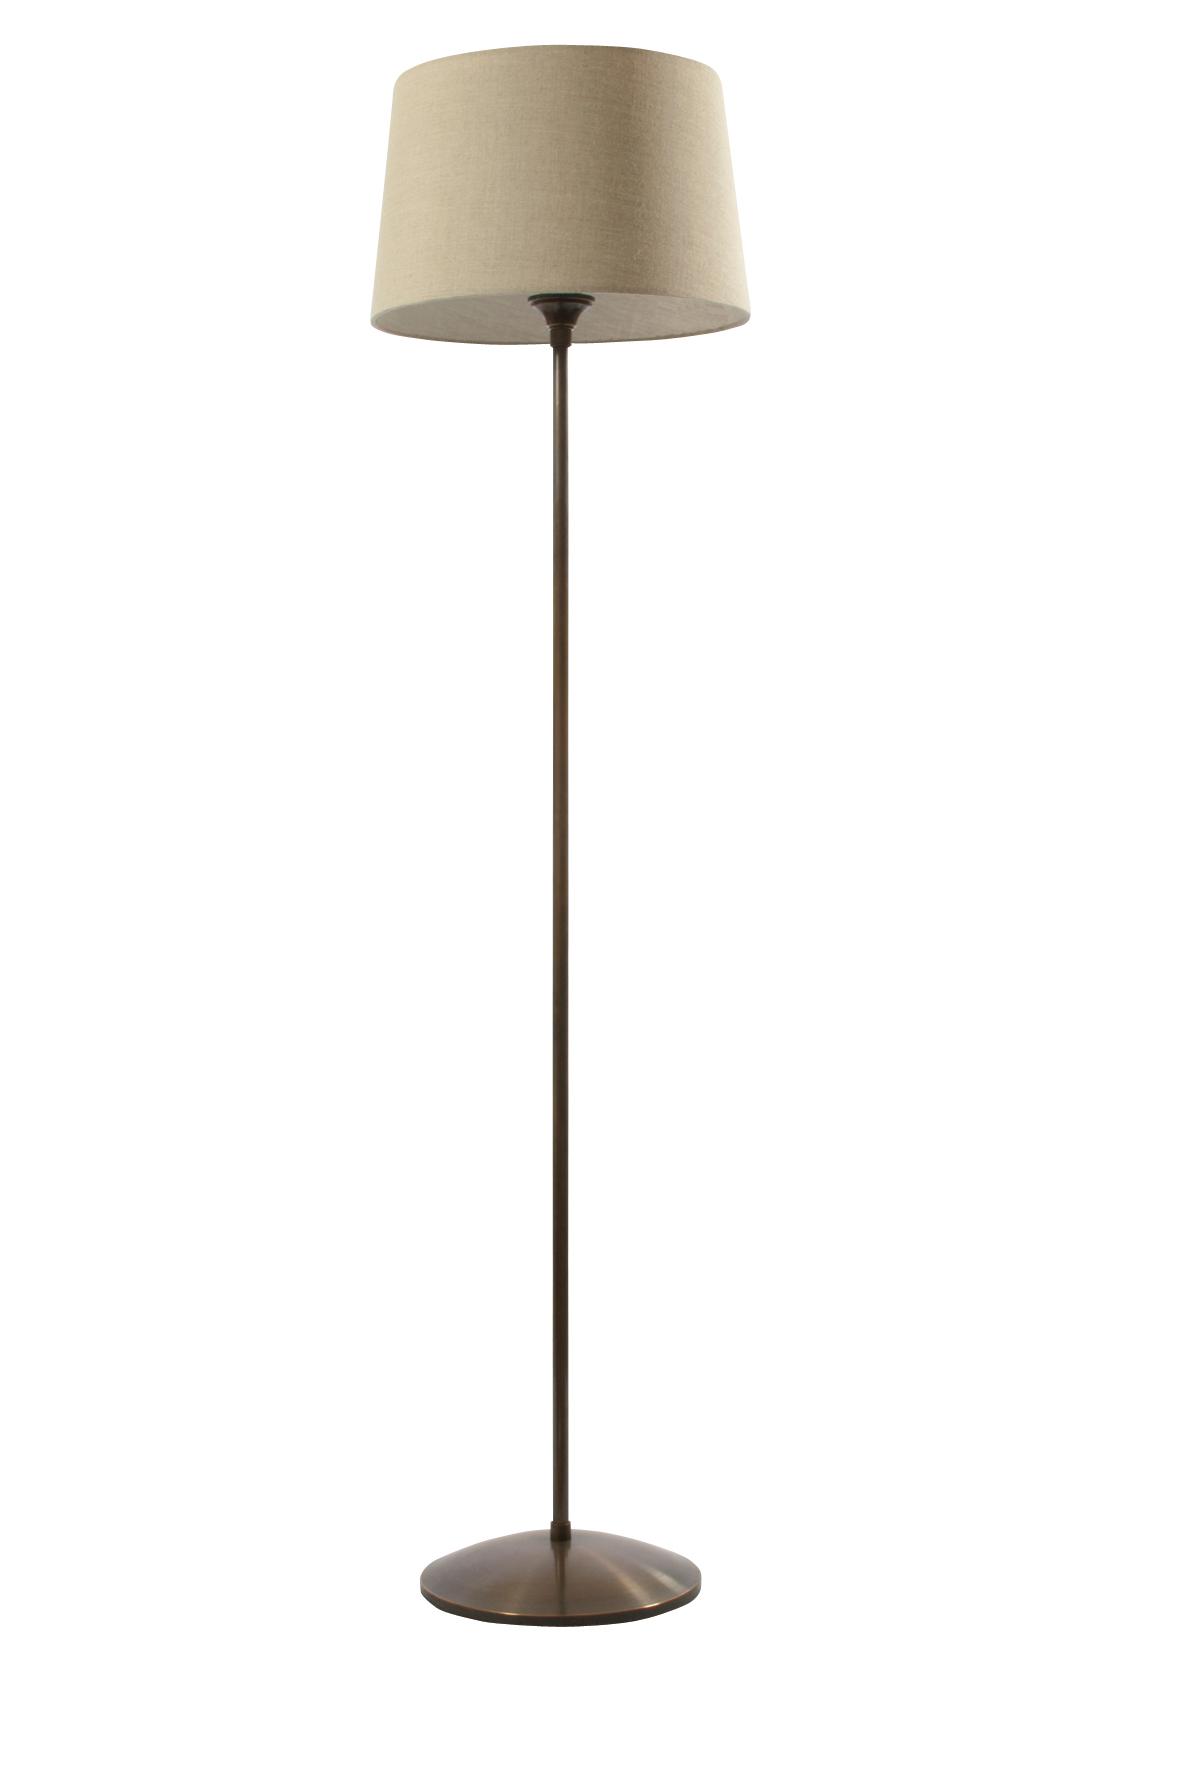 Badezimmer Lampe Rustikal Wohnzimmer Ideen Holz Am Besten Deko